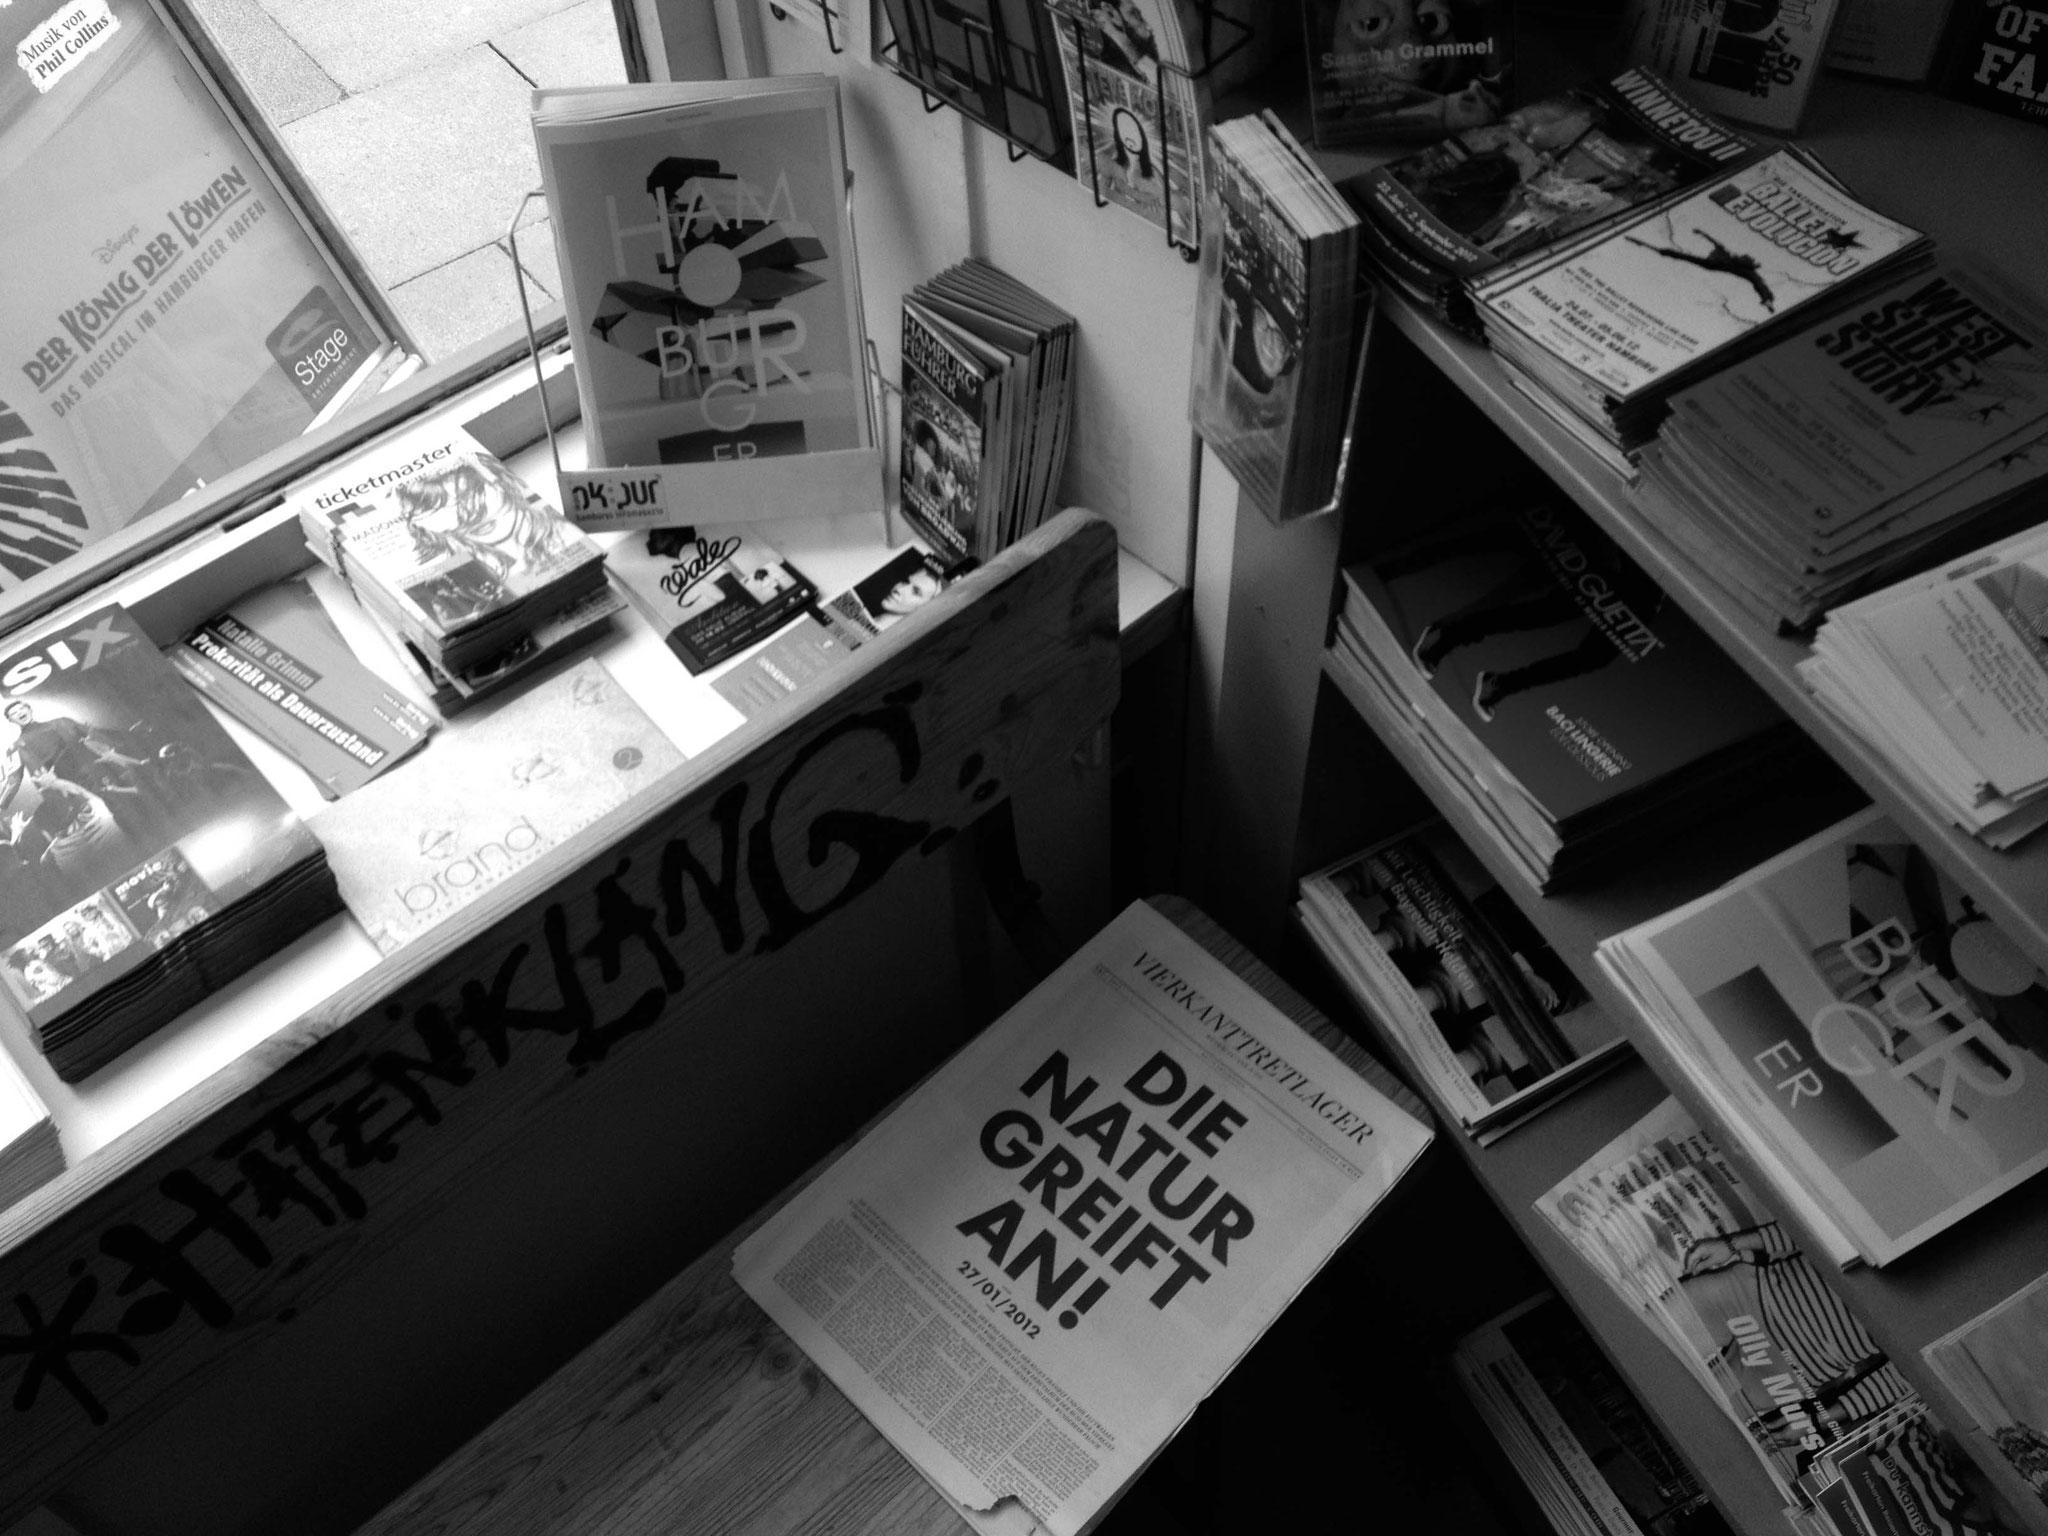 Magazinauslage